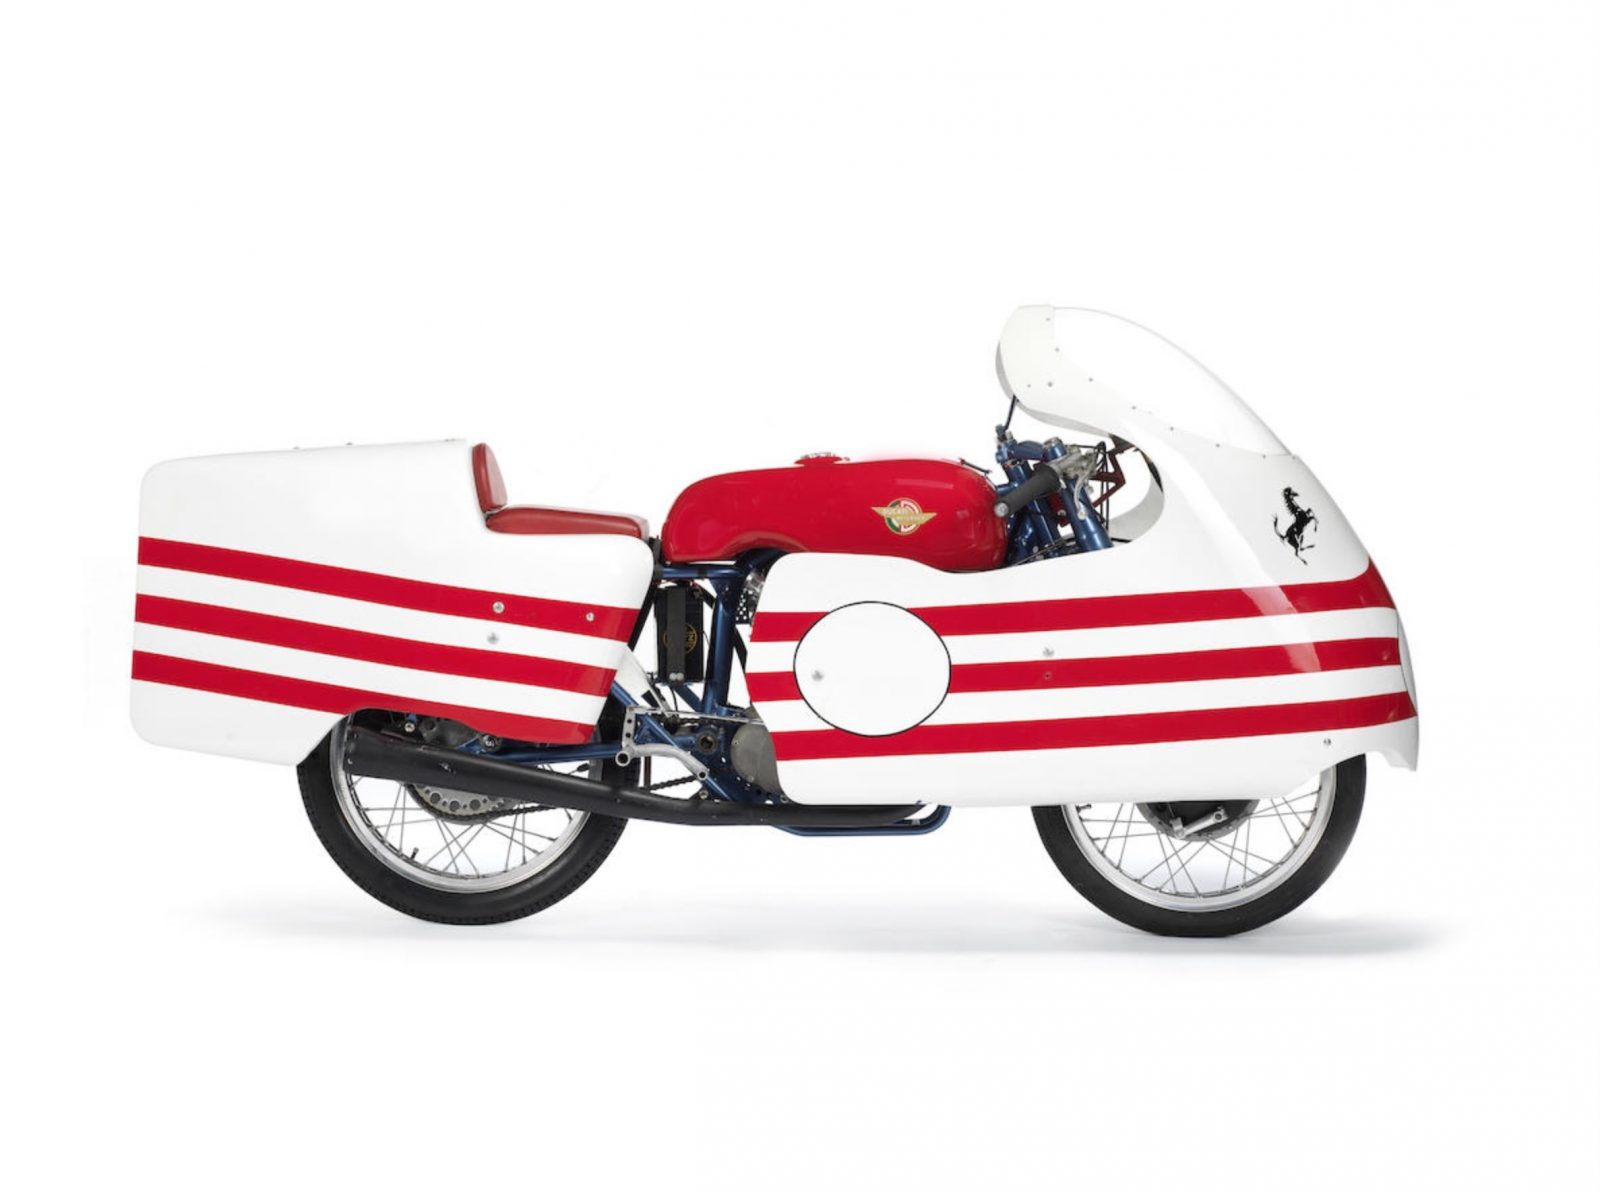 The First Desmodromic Ducati - The Trialbero Racer